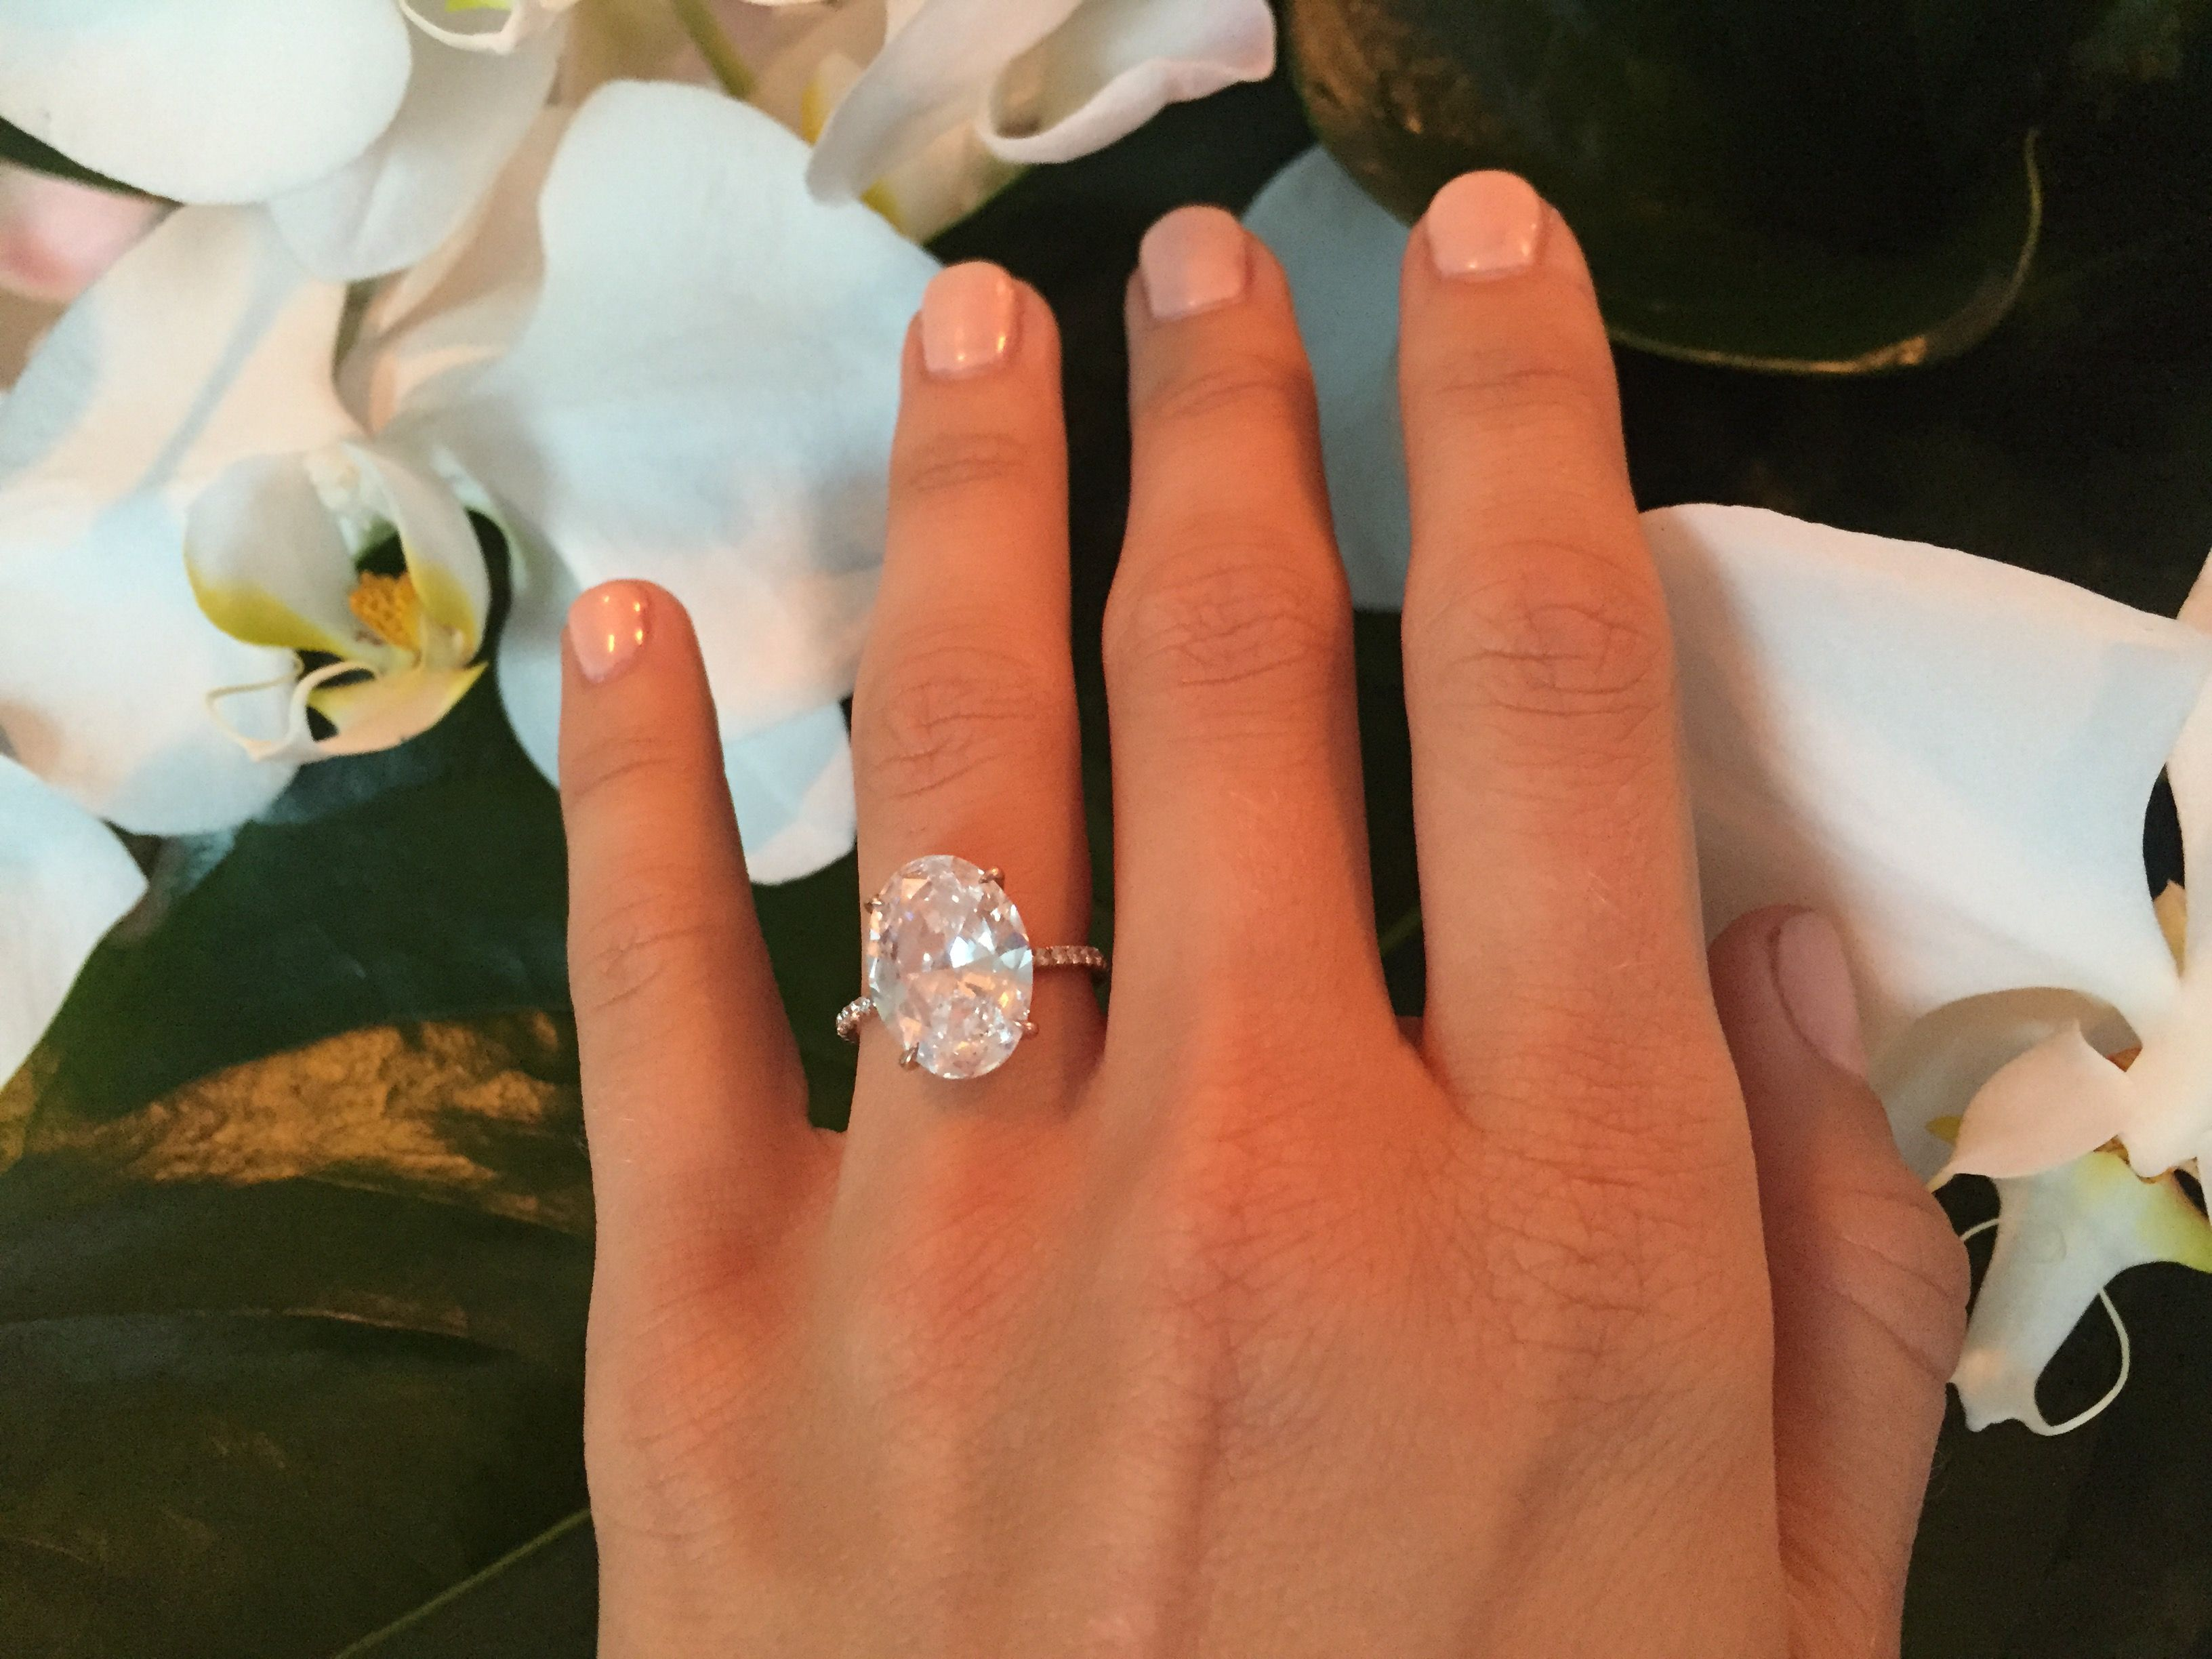 A classic pluscarat ovalshaped diamond lorraine schwartz ring